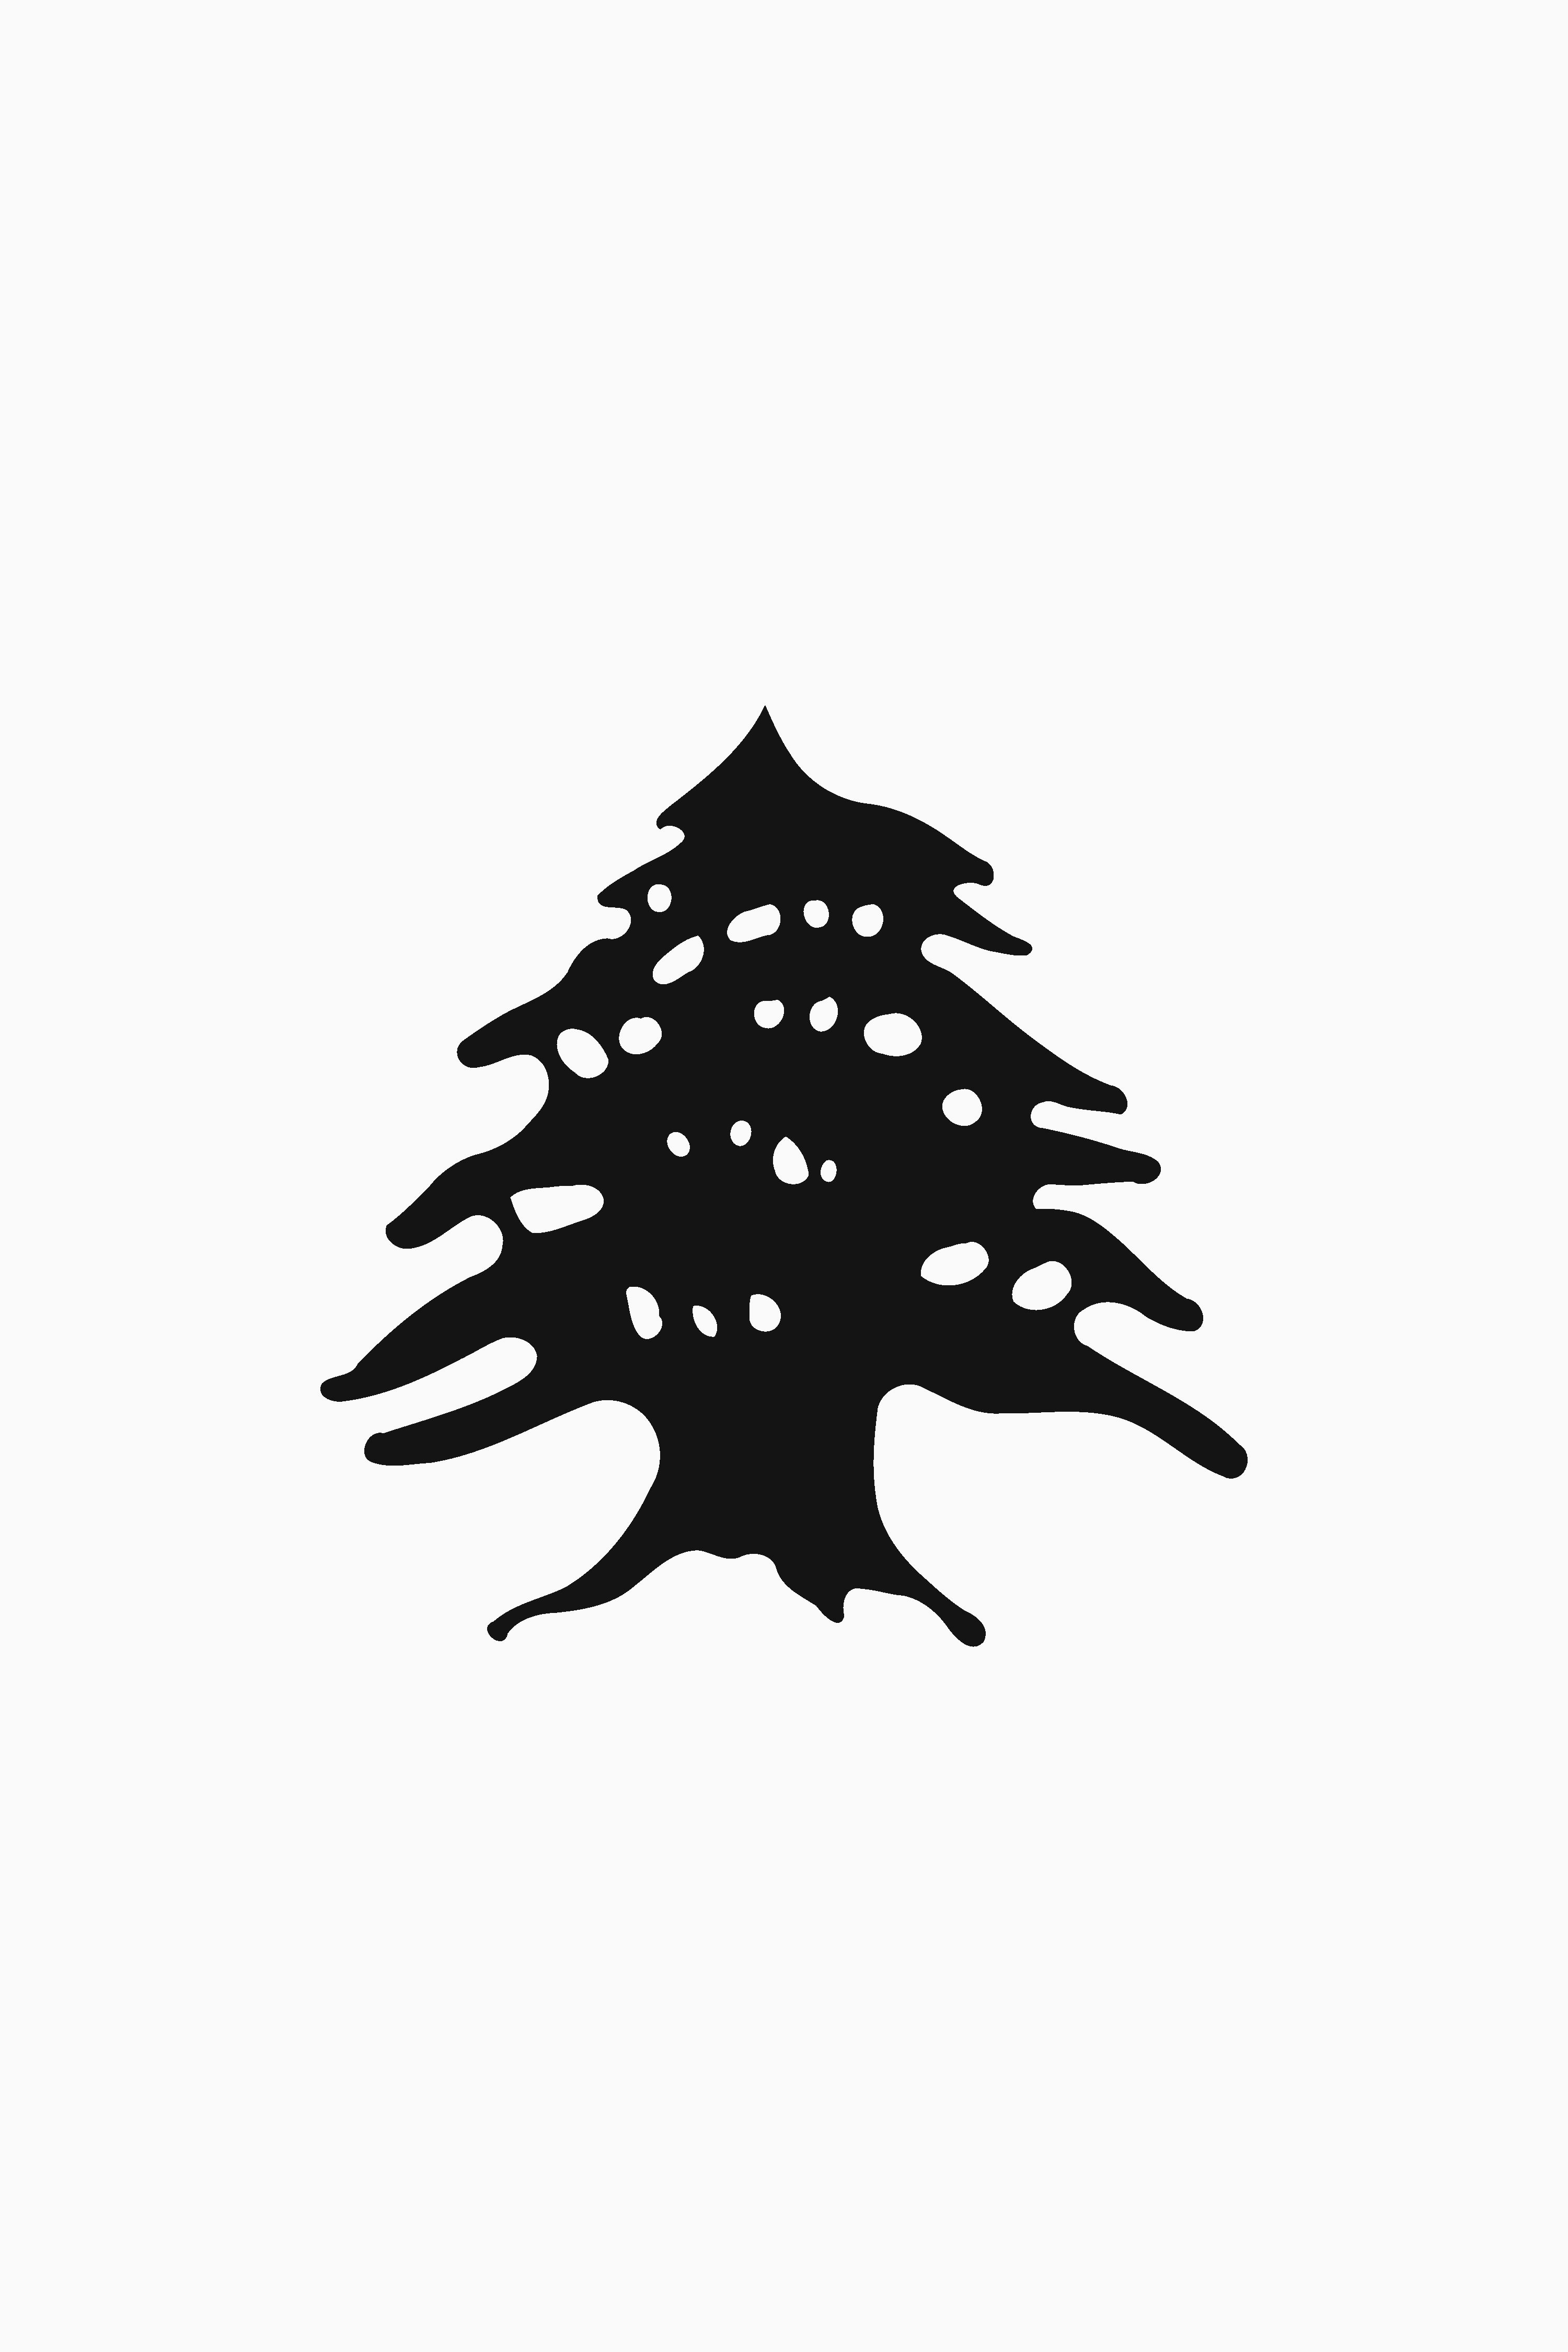 Le Cèdre - Cedar Tree Lebanon Log Clipart (#5749957) - PinClipart